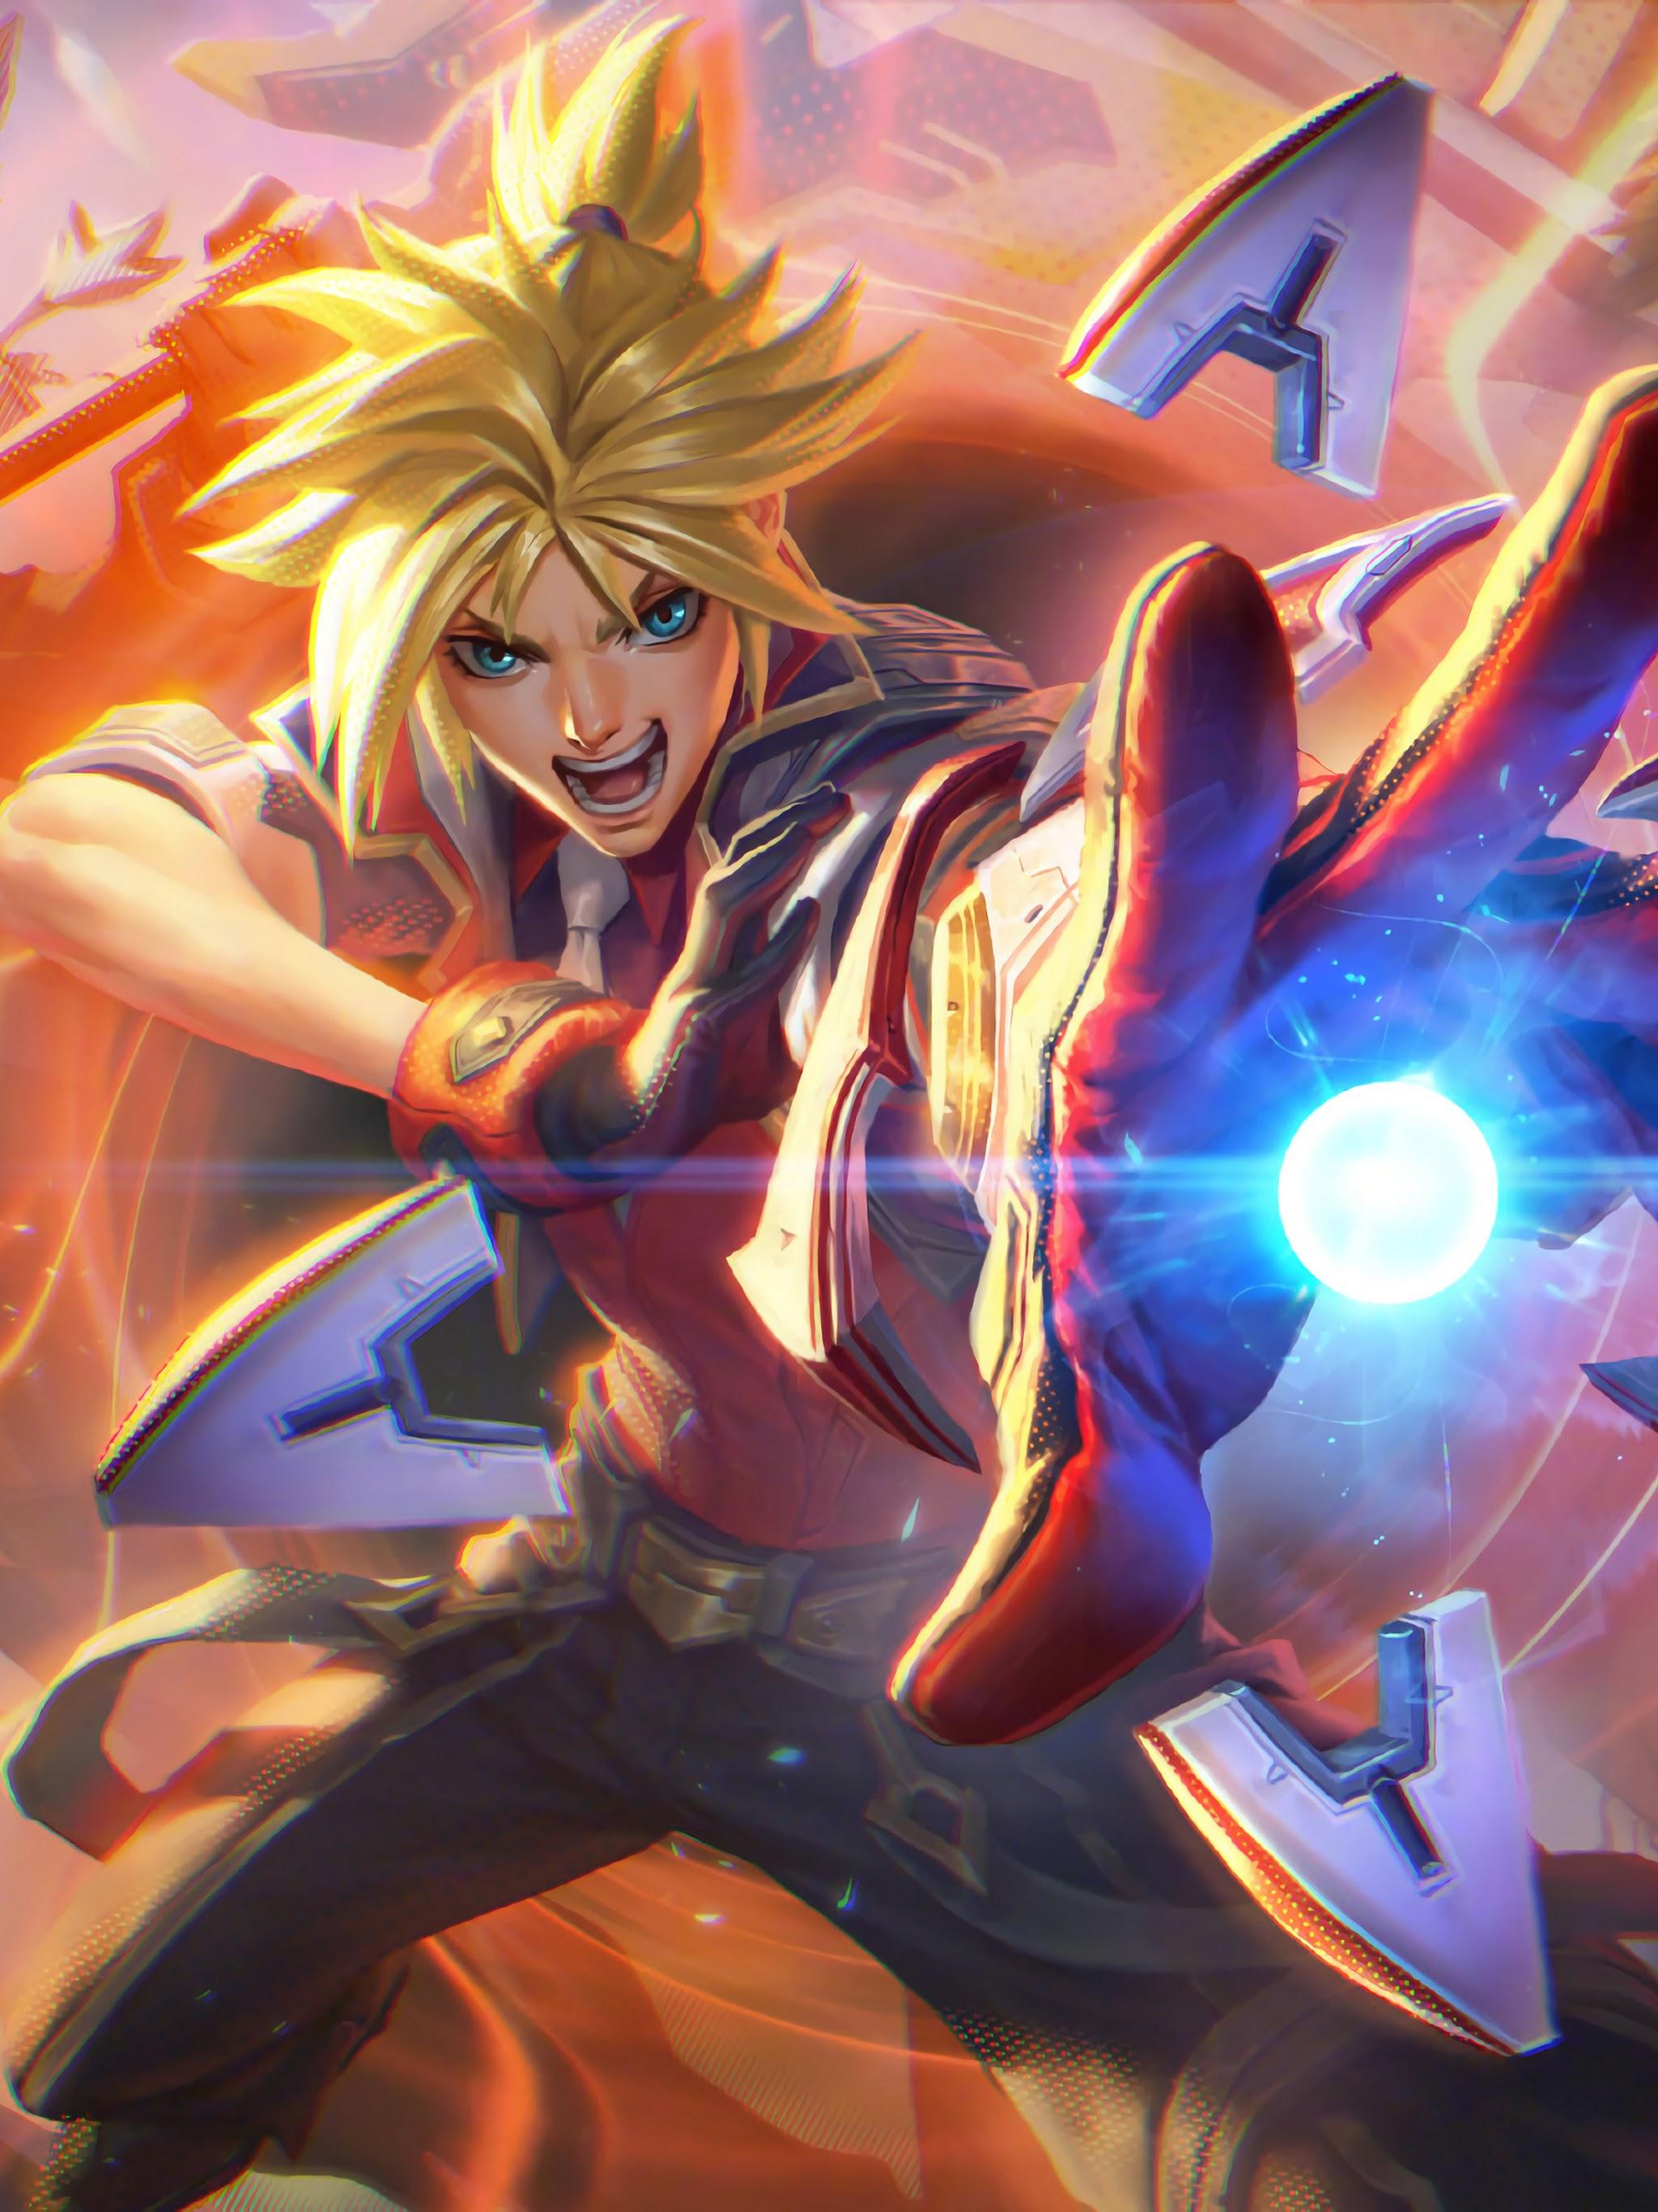 Battle Academia Ezreal Splash Art Lol 4k 77 Wallpaper